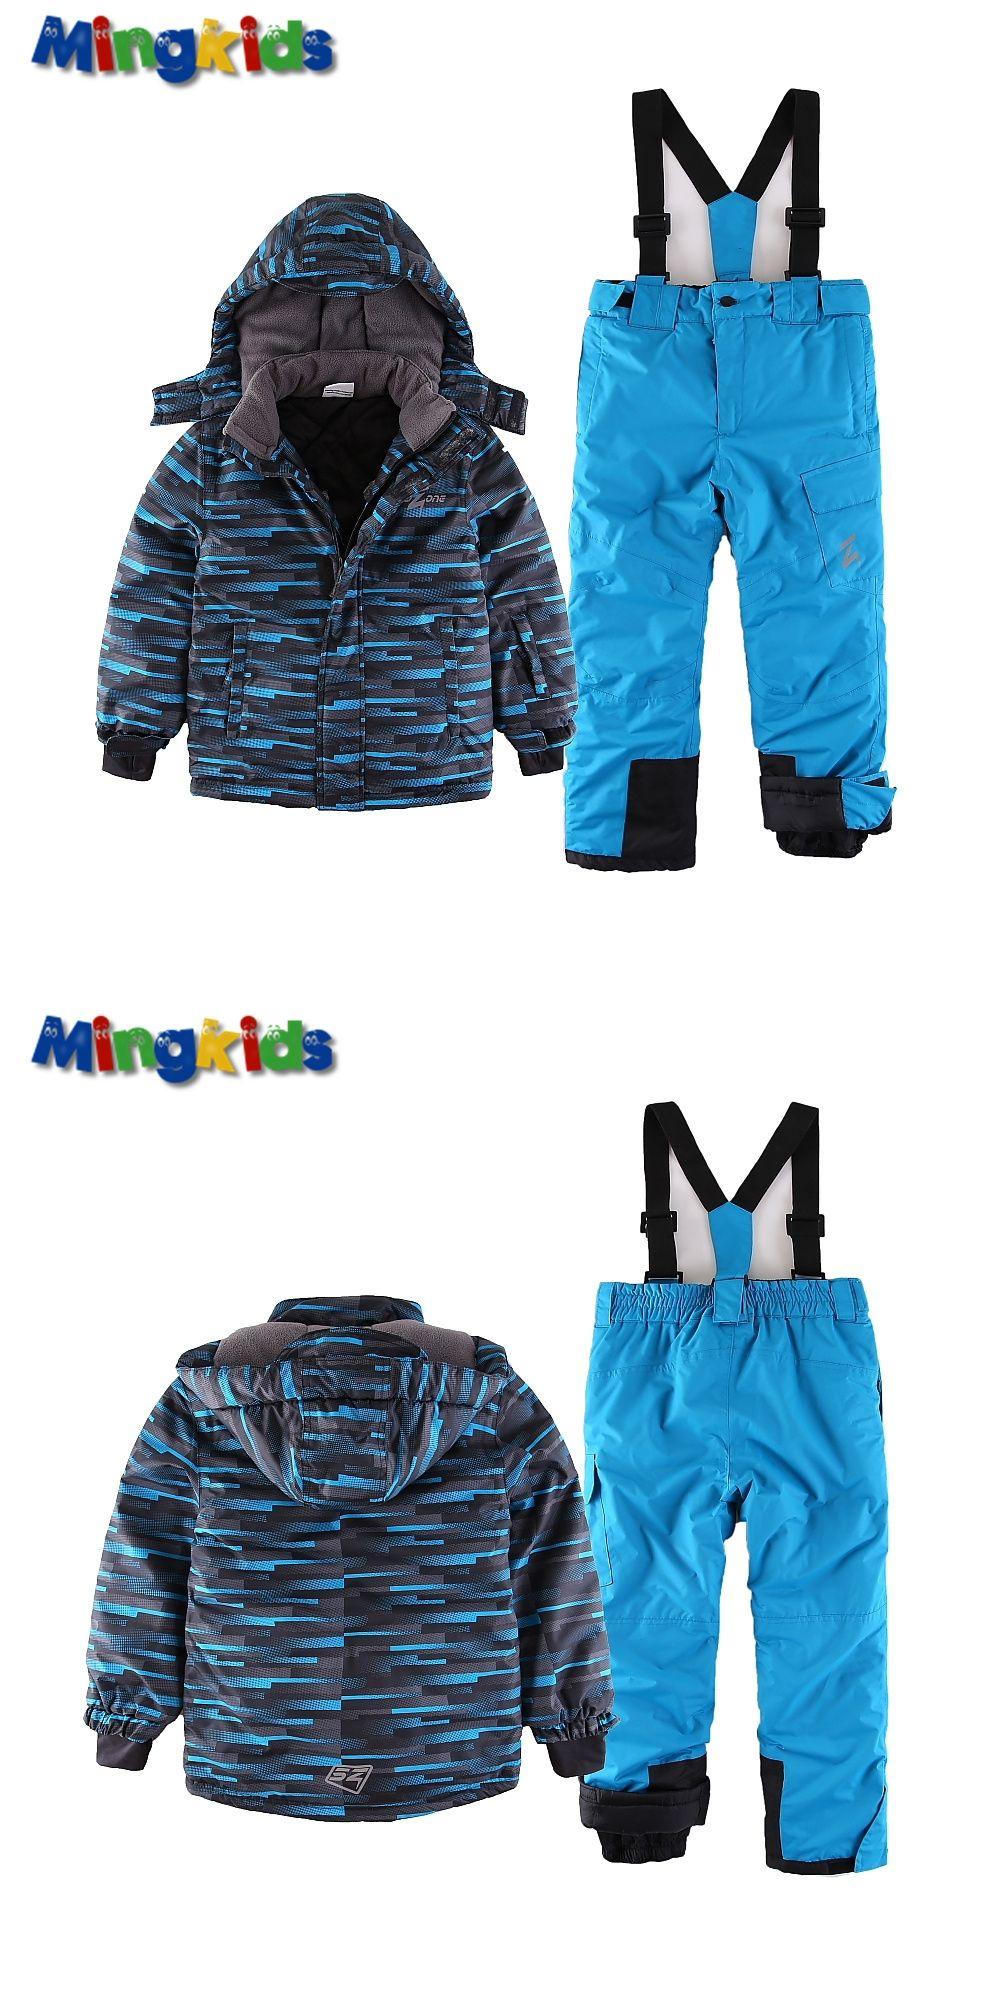 7f45ef990 Mingkids toddler Boy Snowsuit Outdoor Ski set Winter Warm Snow Suit ...